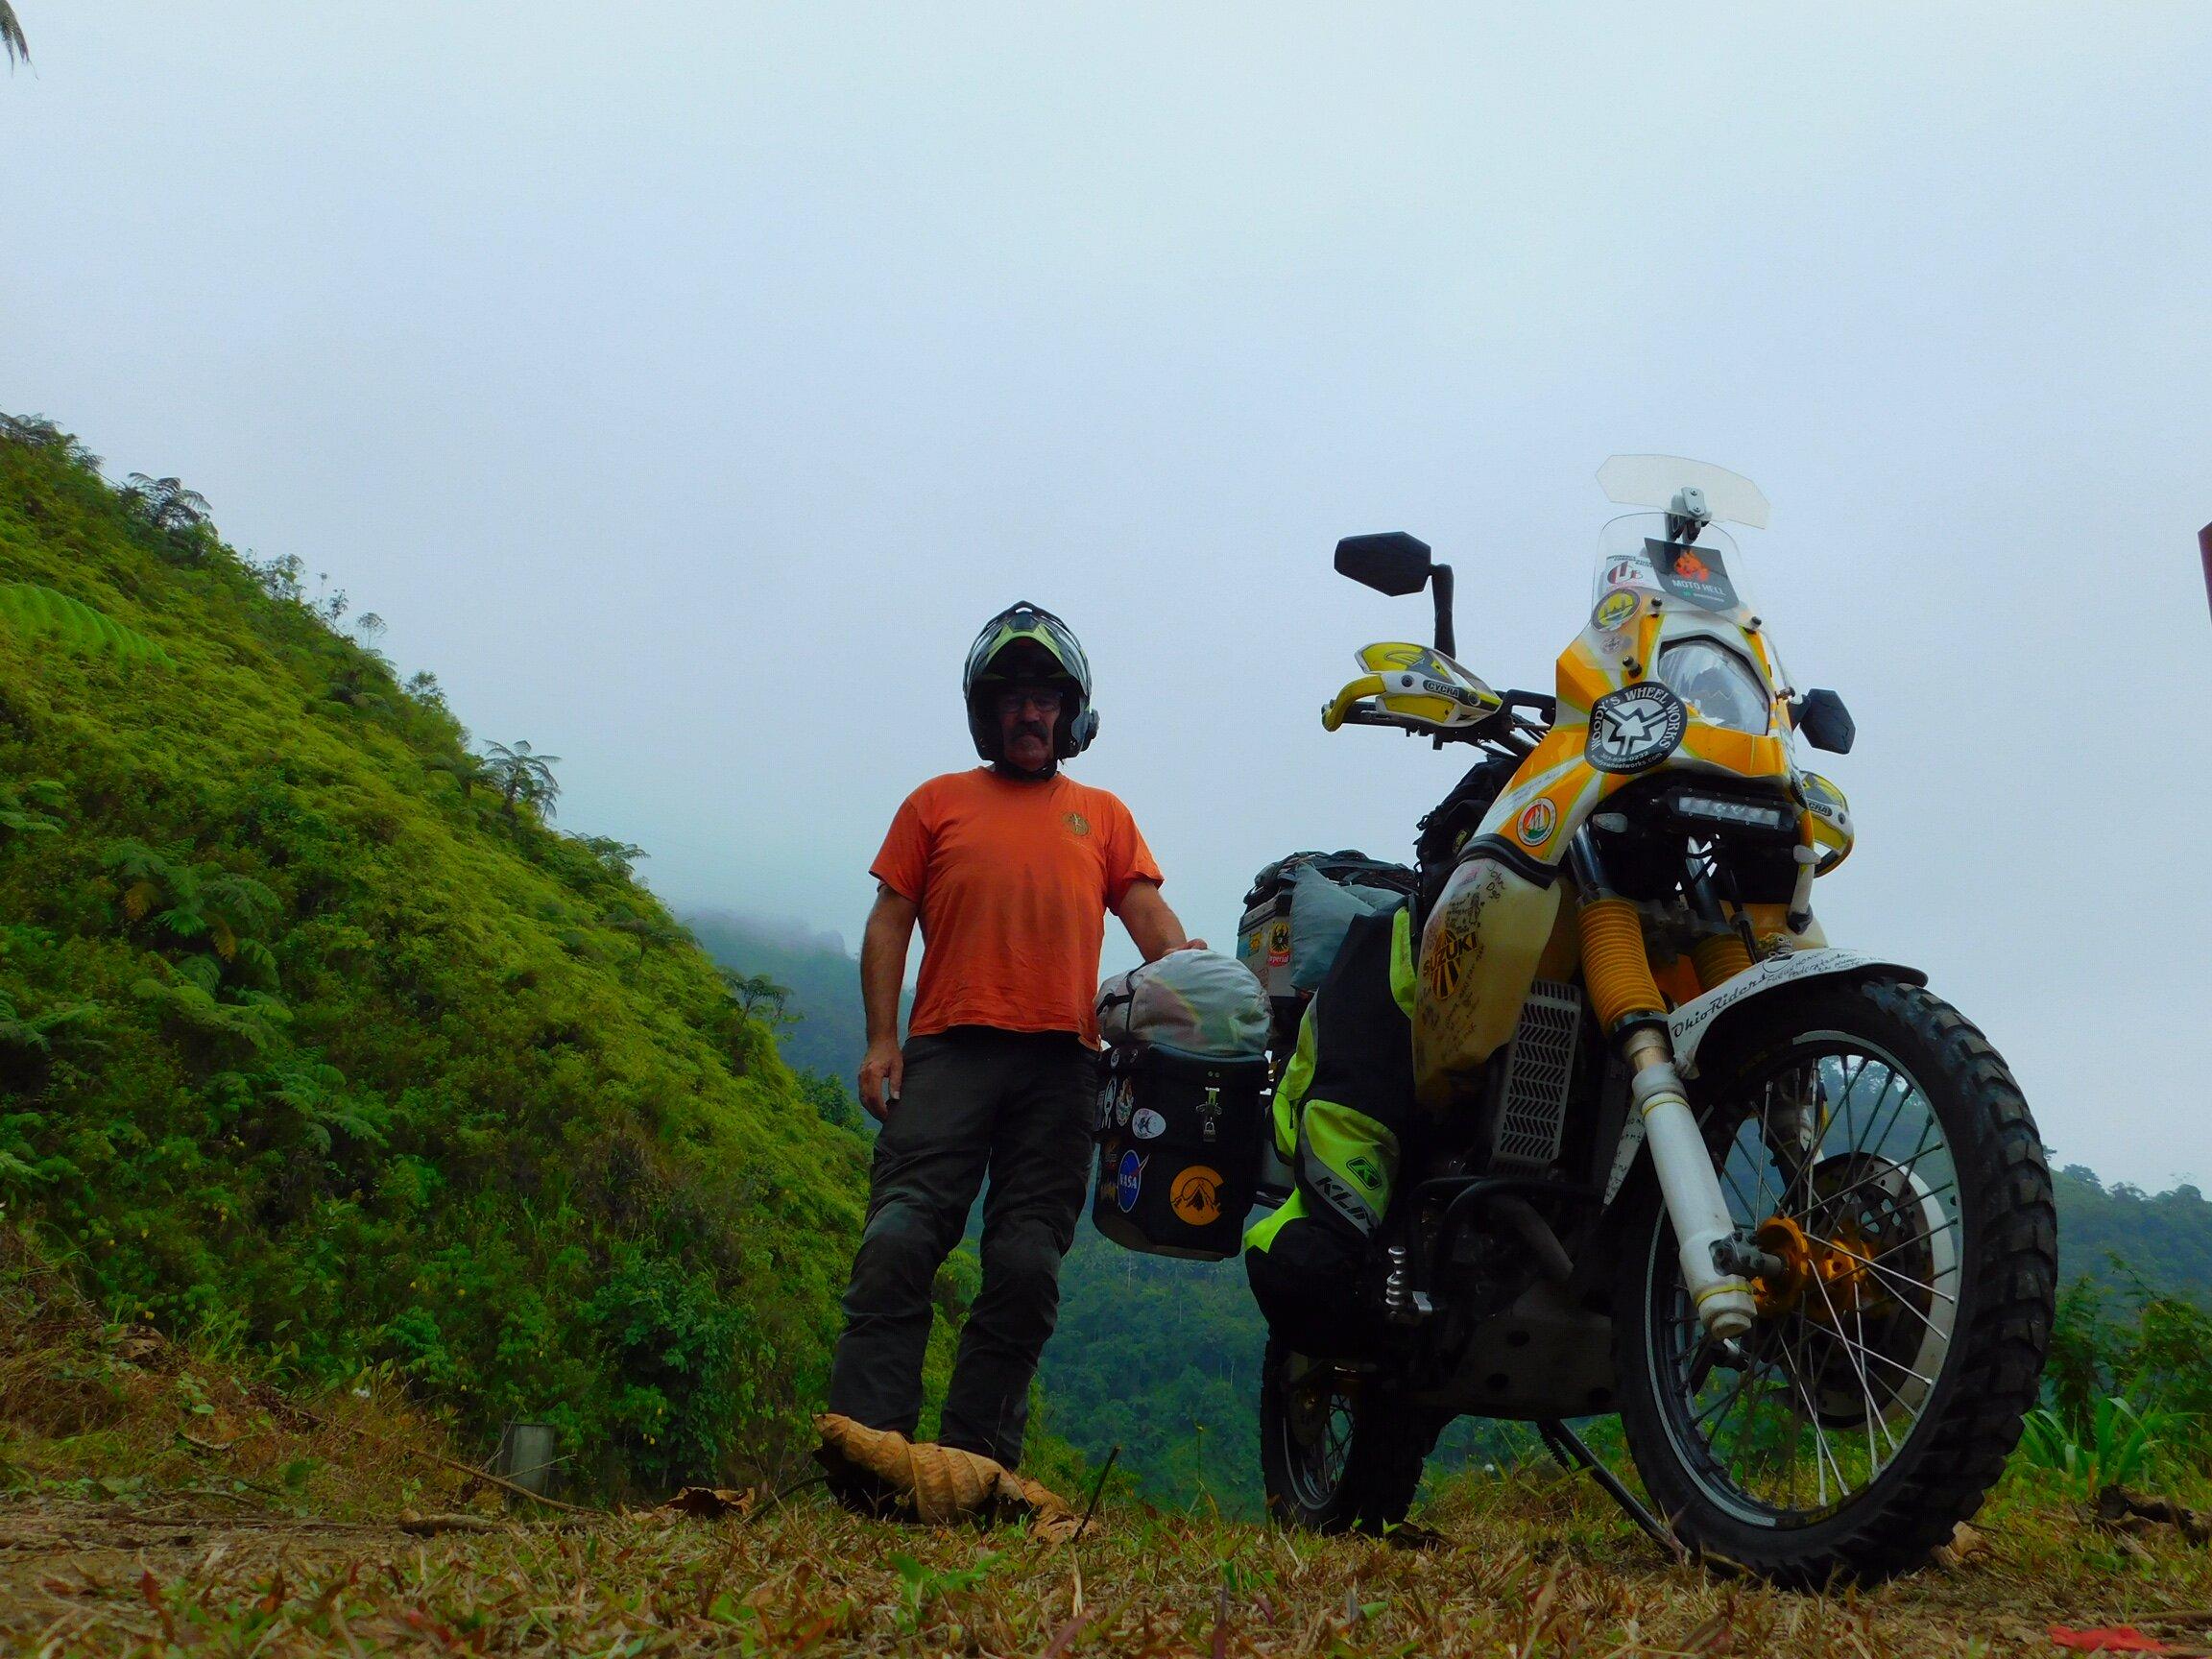 Dan-Byers-Adventure-Rider-Radio-Motorcycle-Podcast-2.jpeg